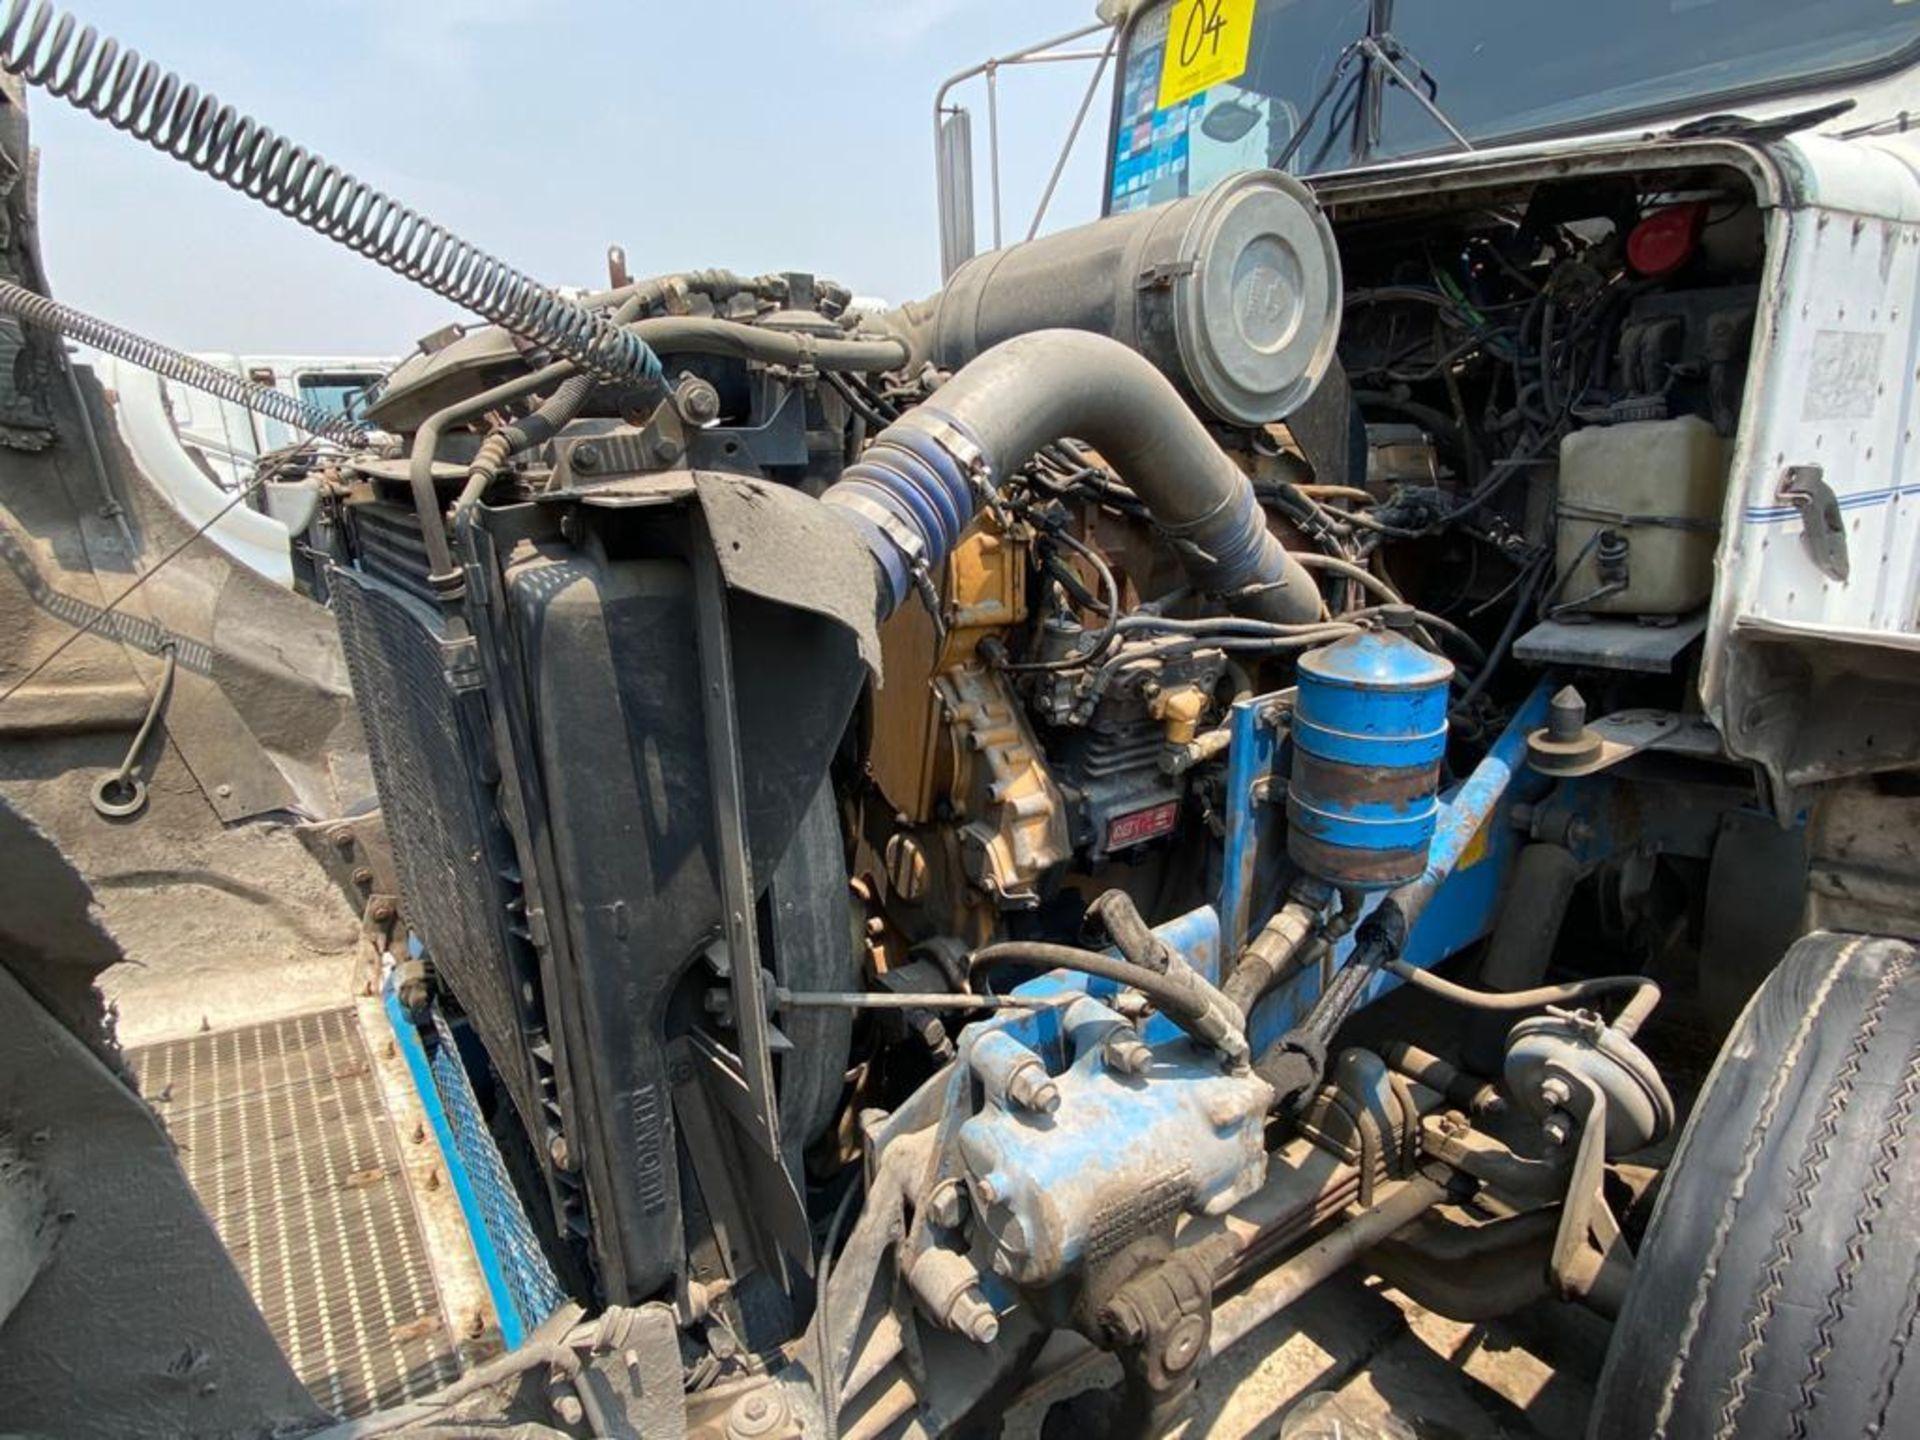 1999 Kenworth Sleeper truck tractor, standard transmission of 18 speeds - Image 58 of 70